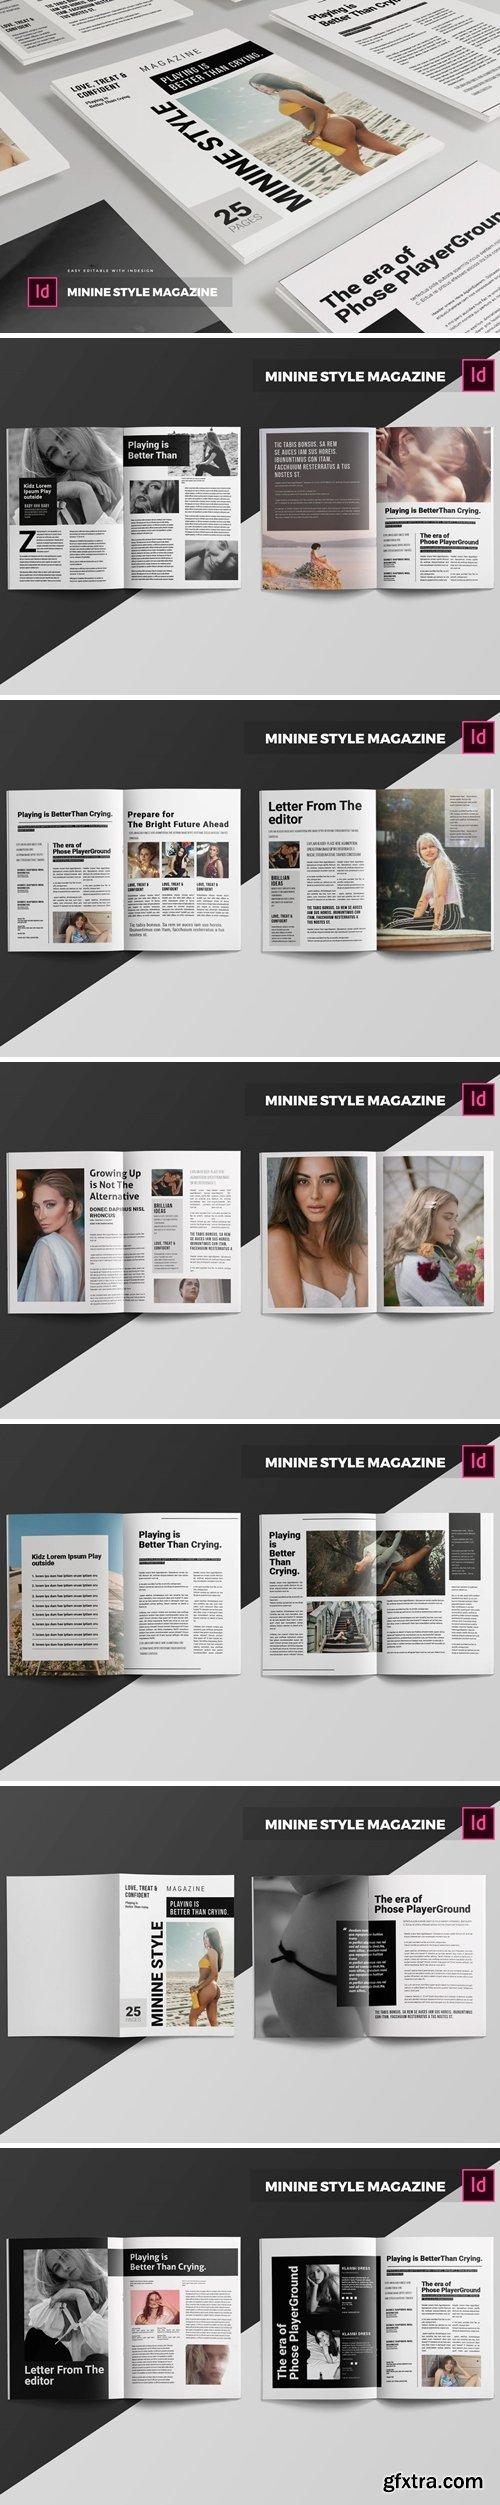 Minine Style   Magazine Template